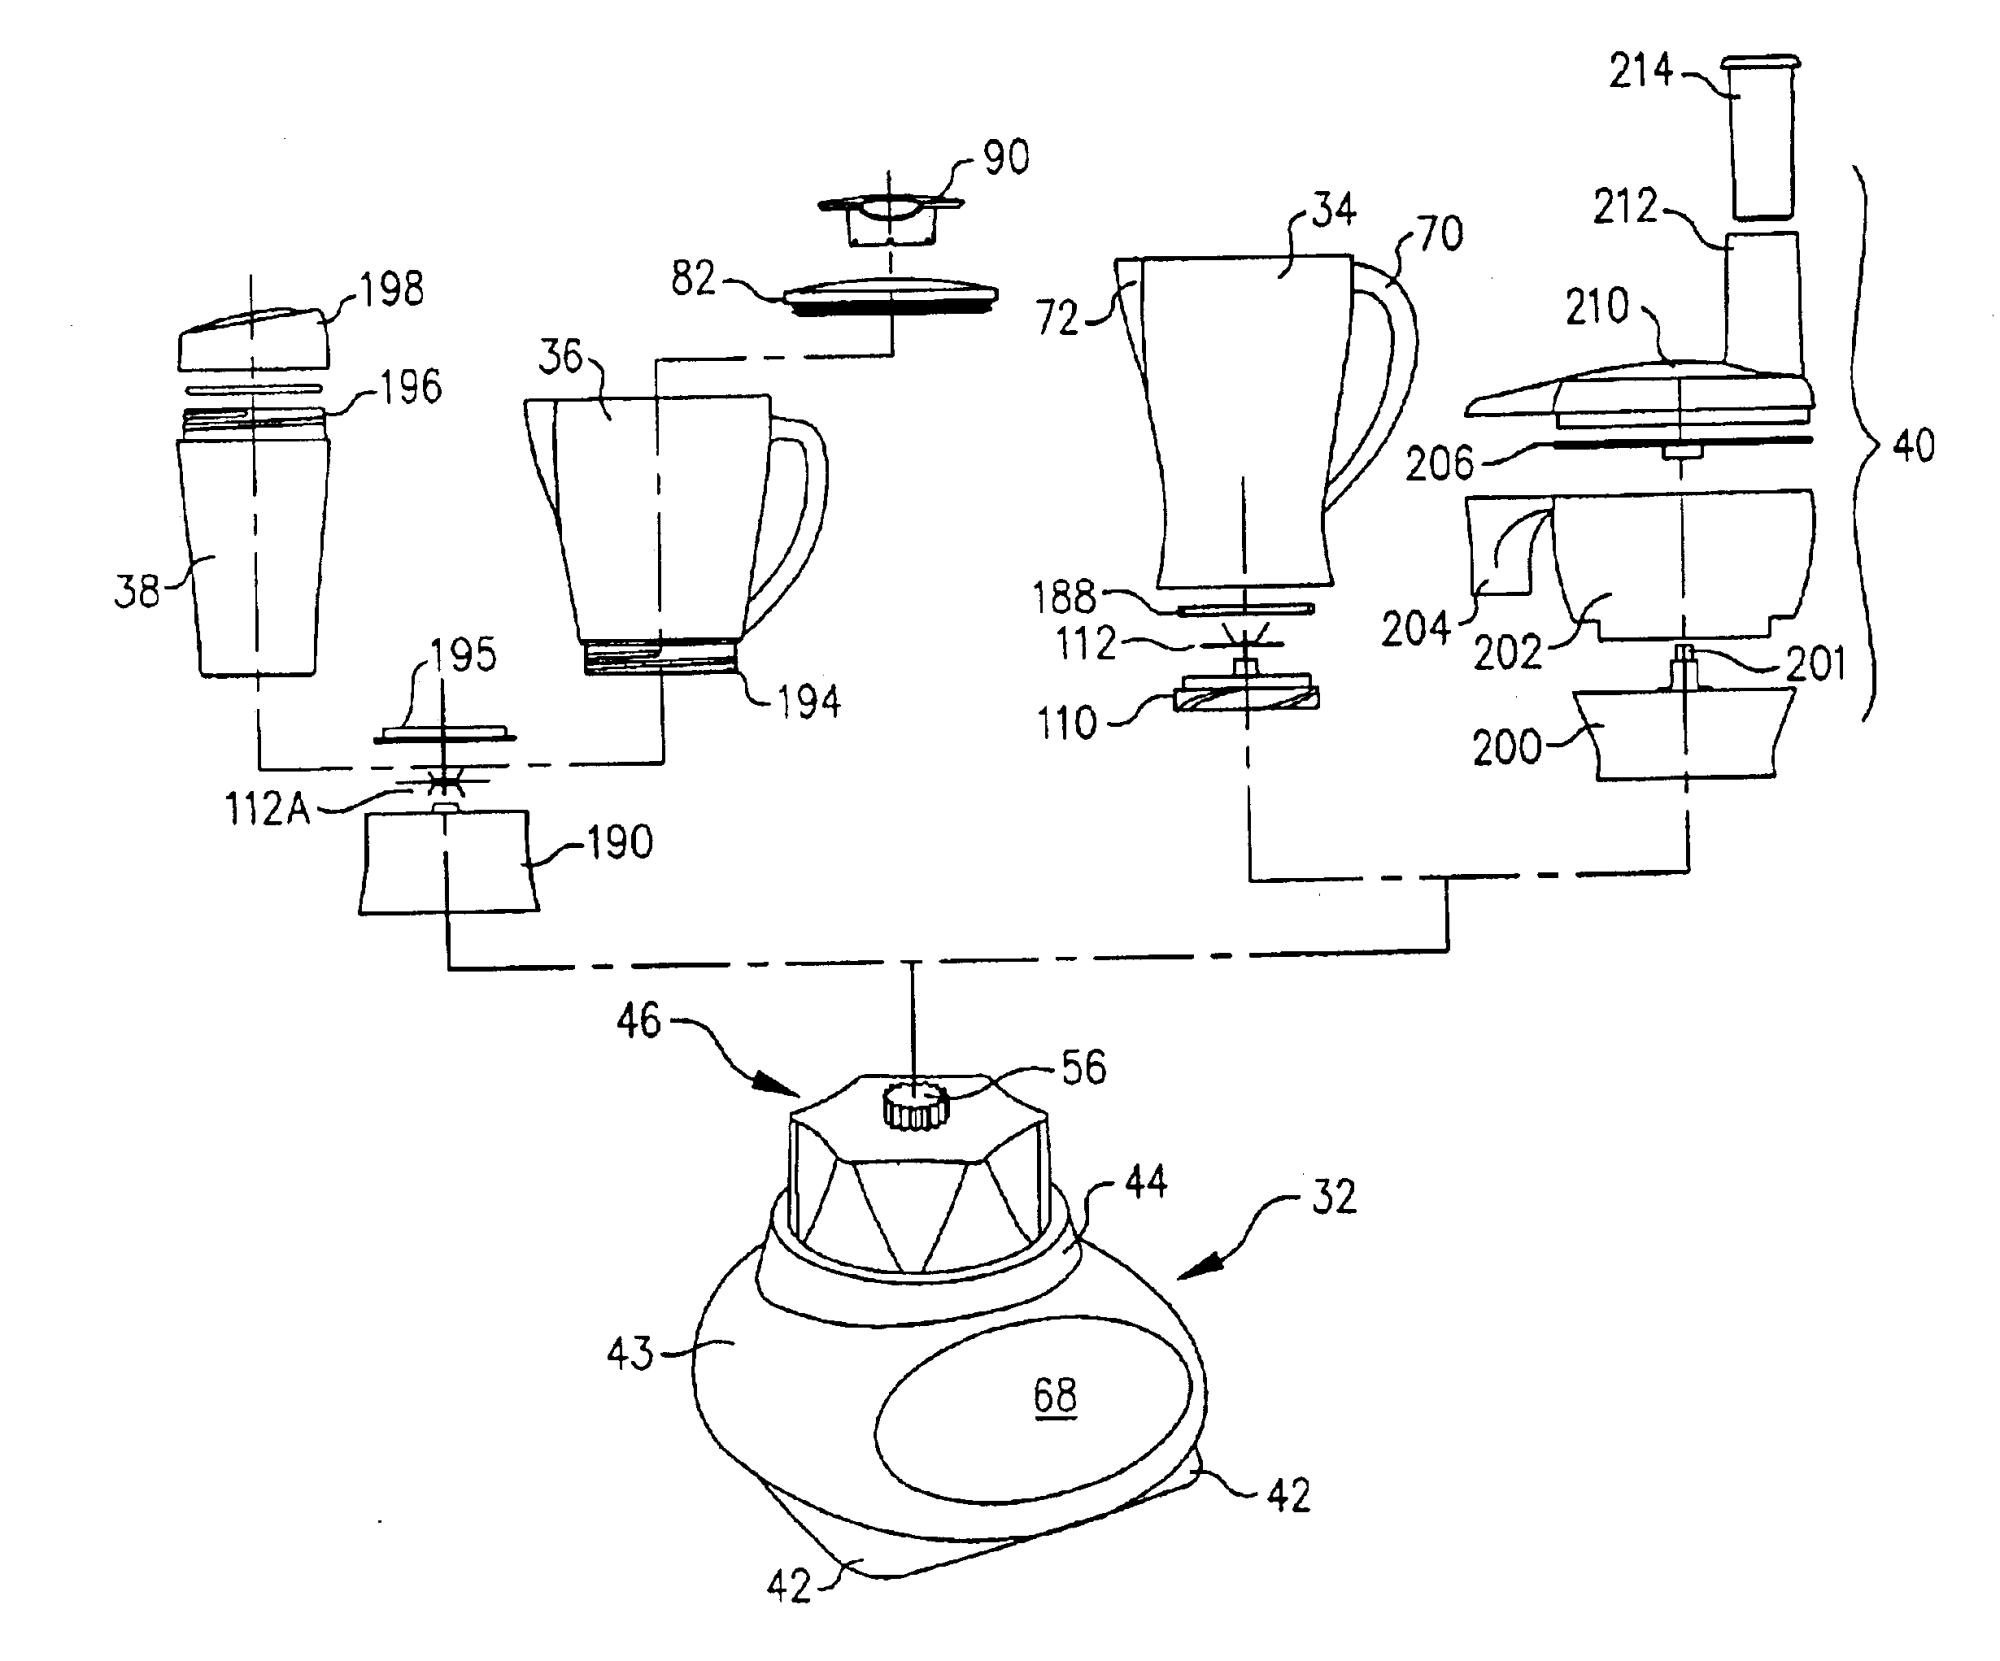 hight resolution of mixer grinder wiring diagram 28 wiring diagram images bunn brewer bunn coffee pot parts list